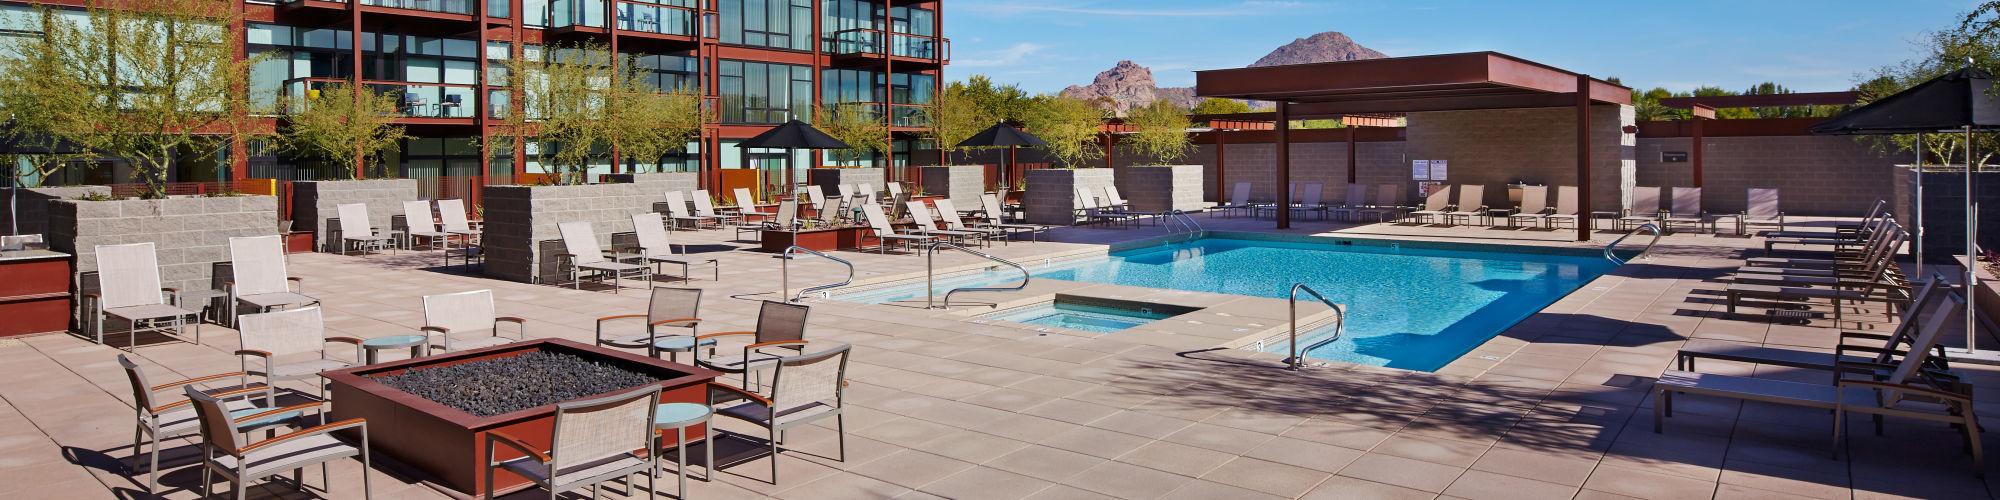 Schedule a tour of Domus in Phoenix, Arizona